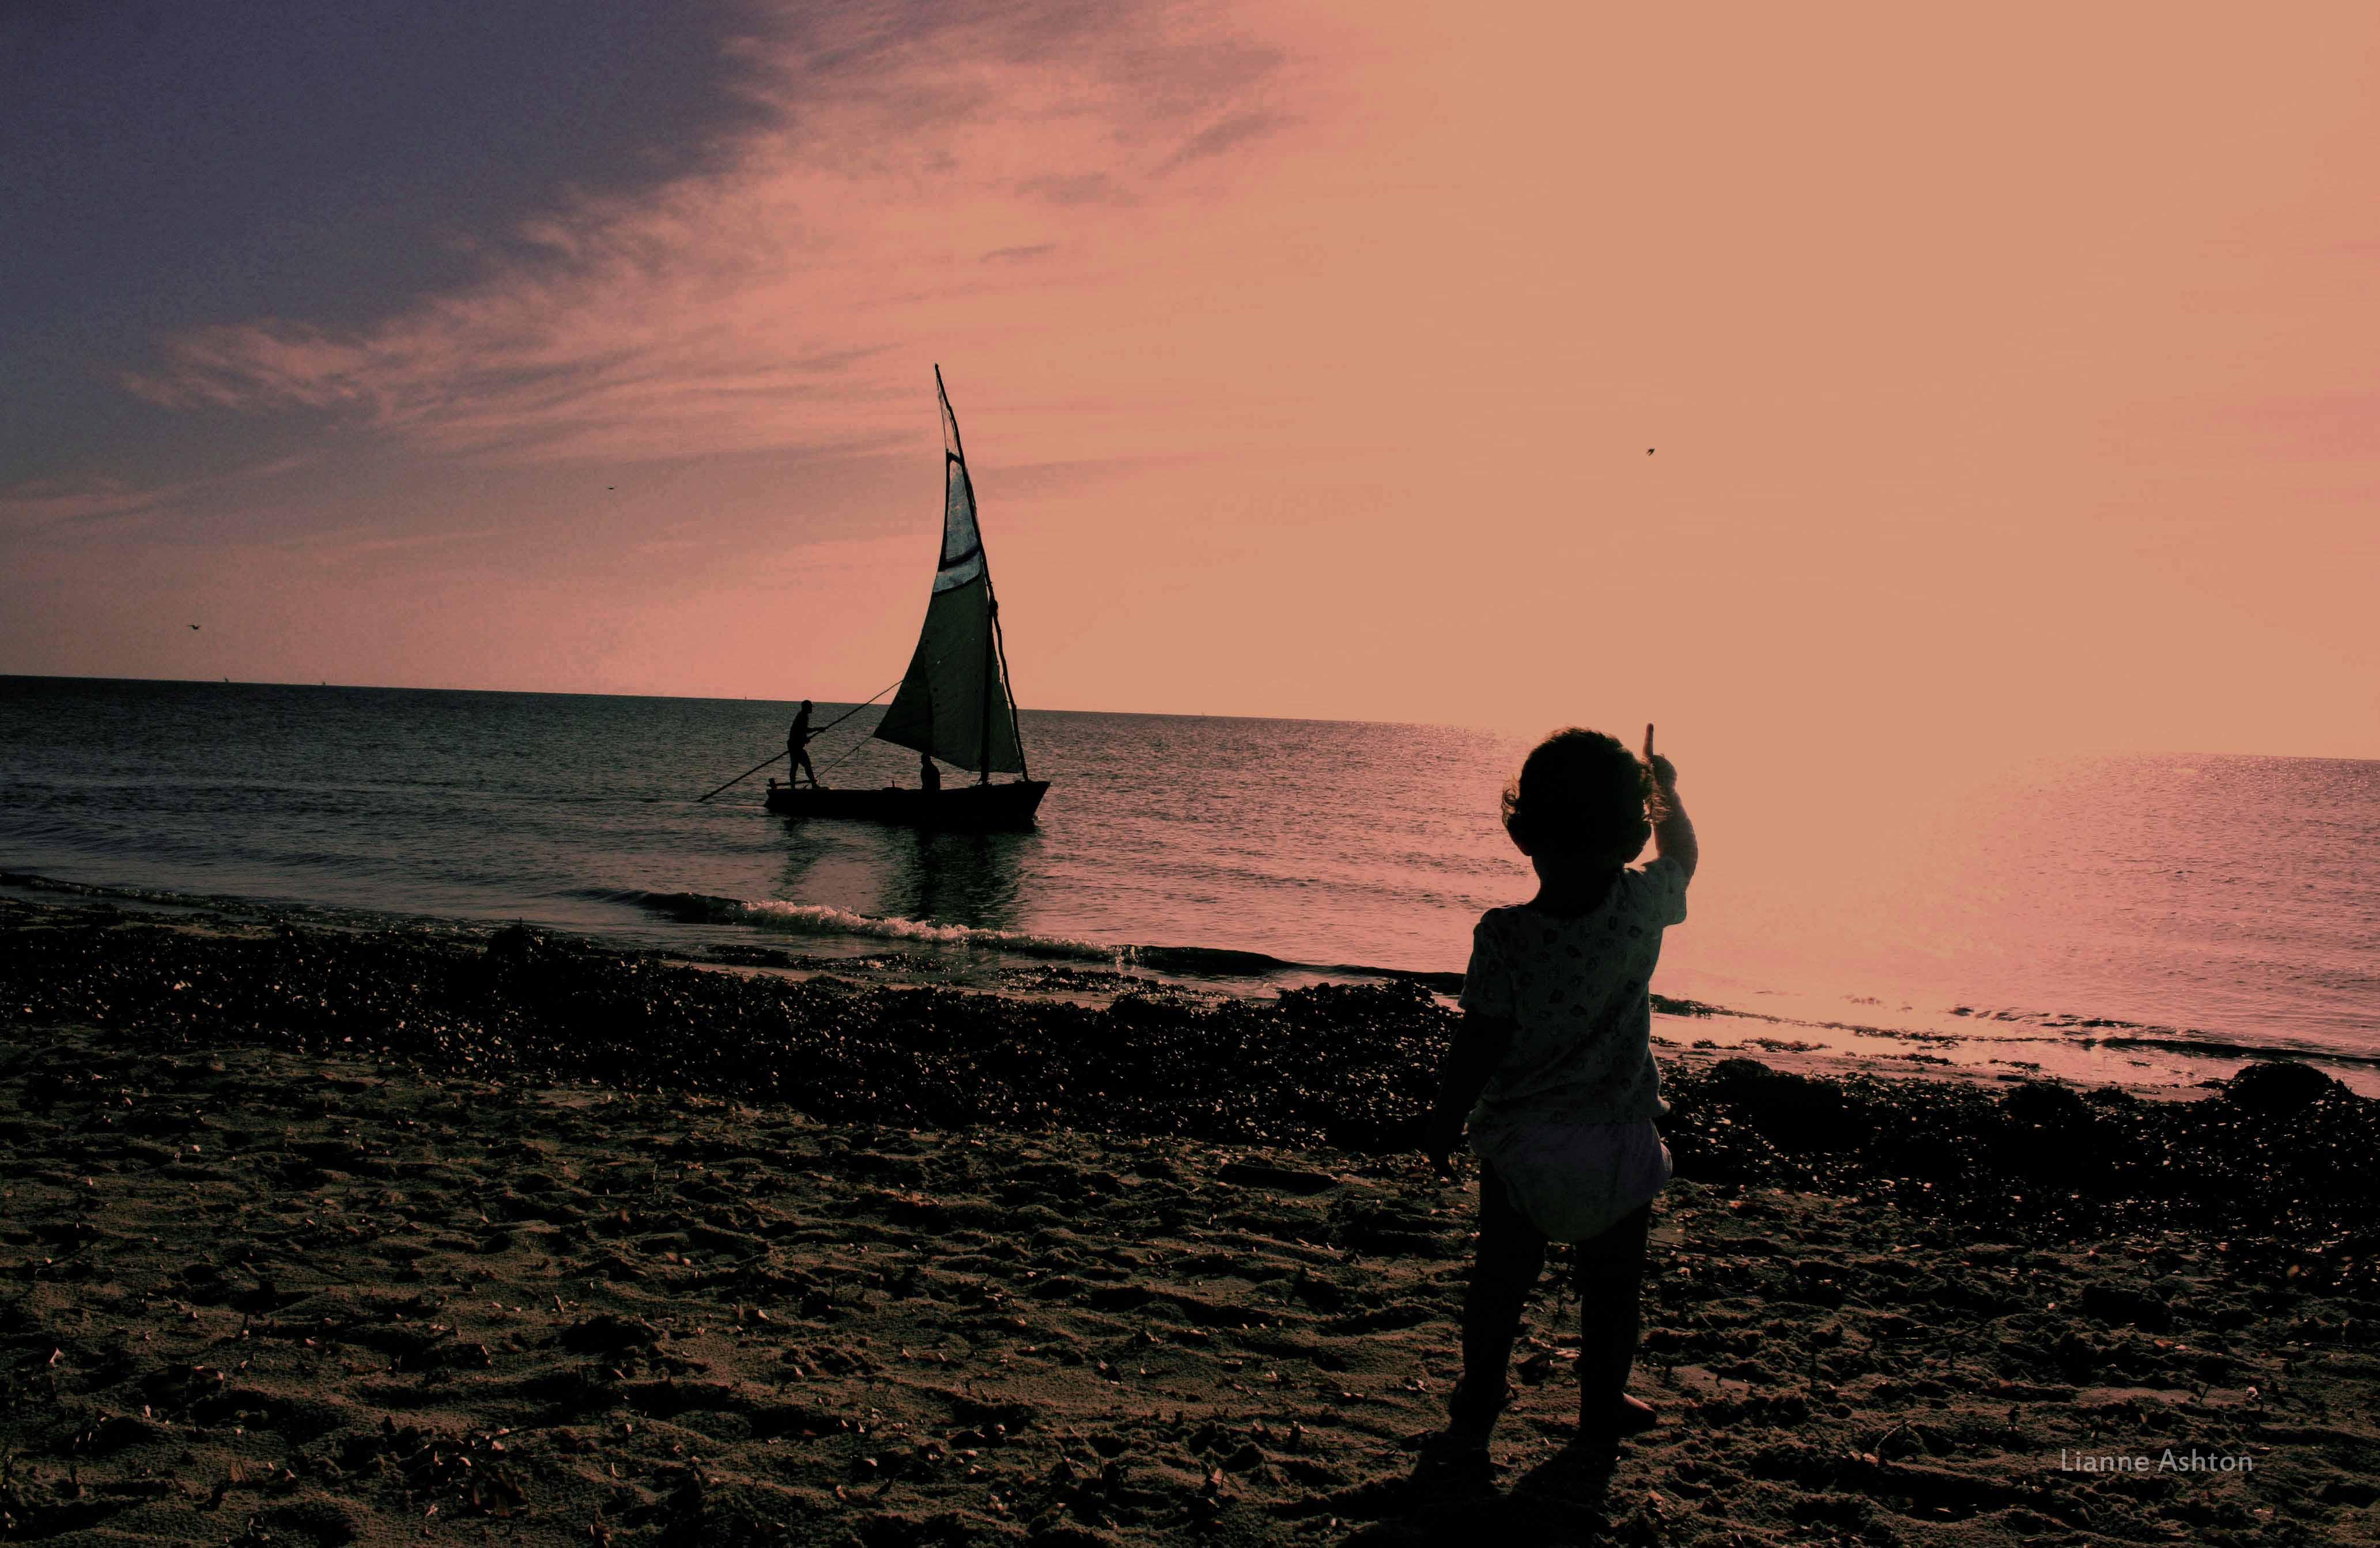 mozambique_edited-2